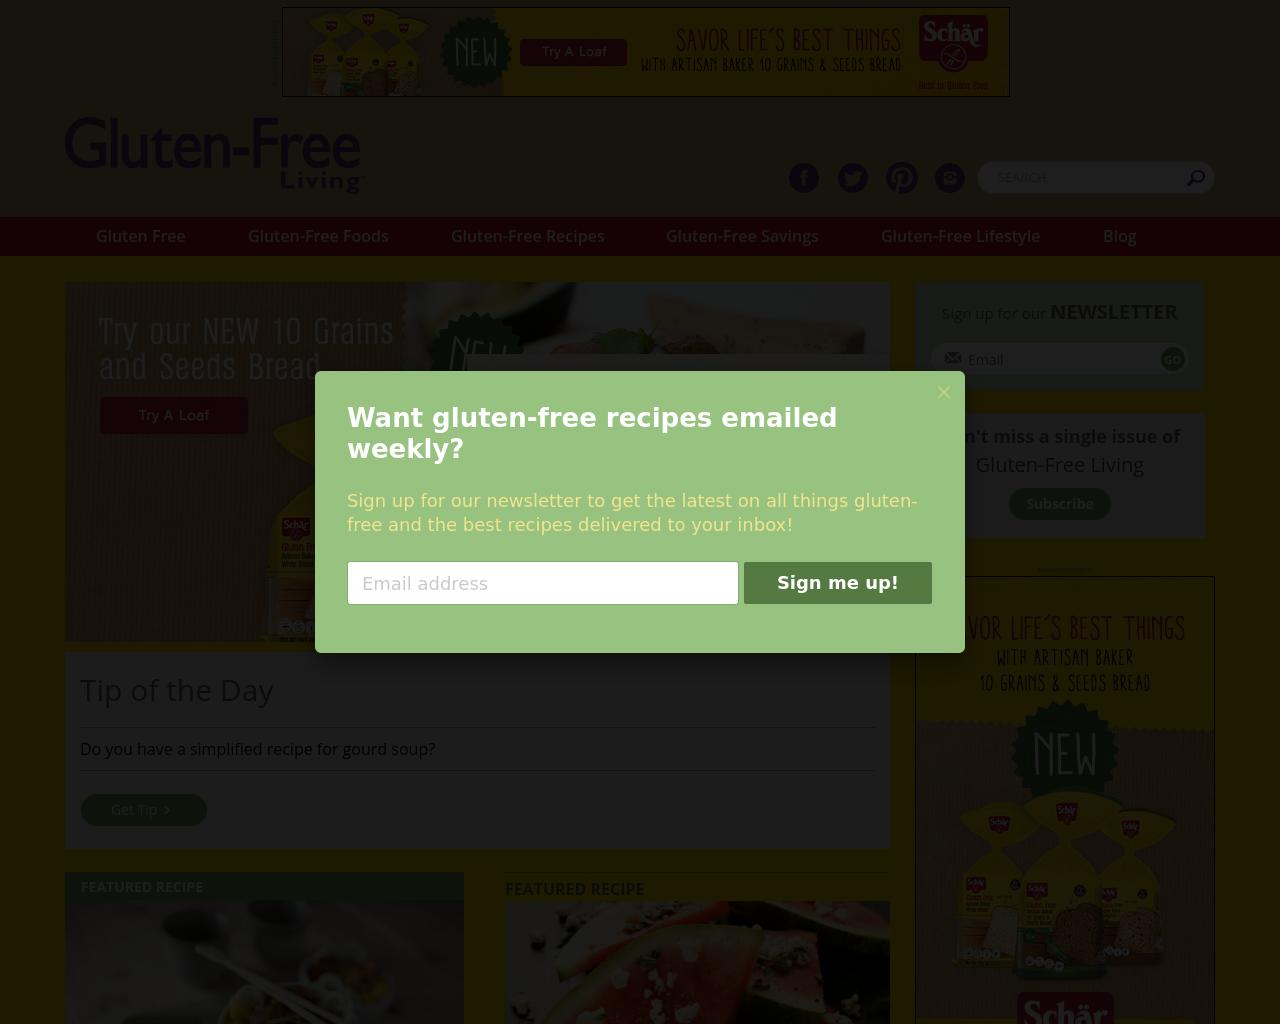 Gluten-Free-Living-Advertising-Reviews-Pricing